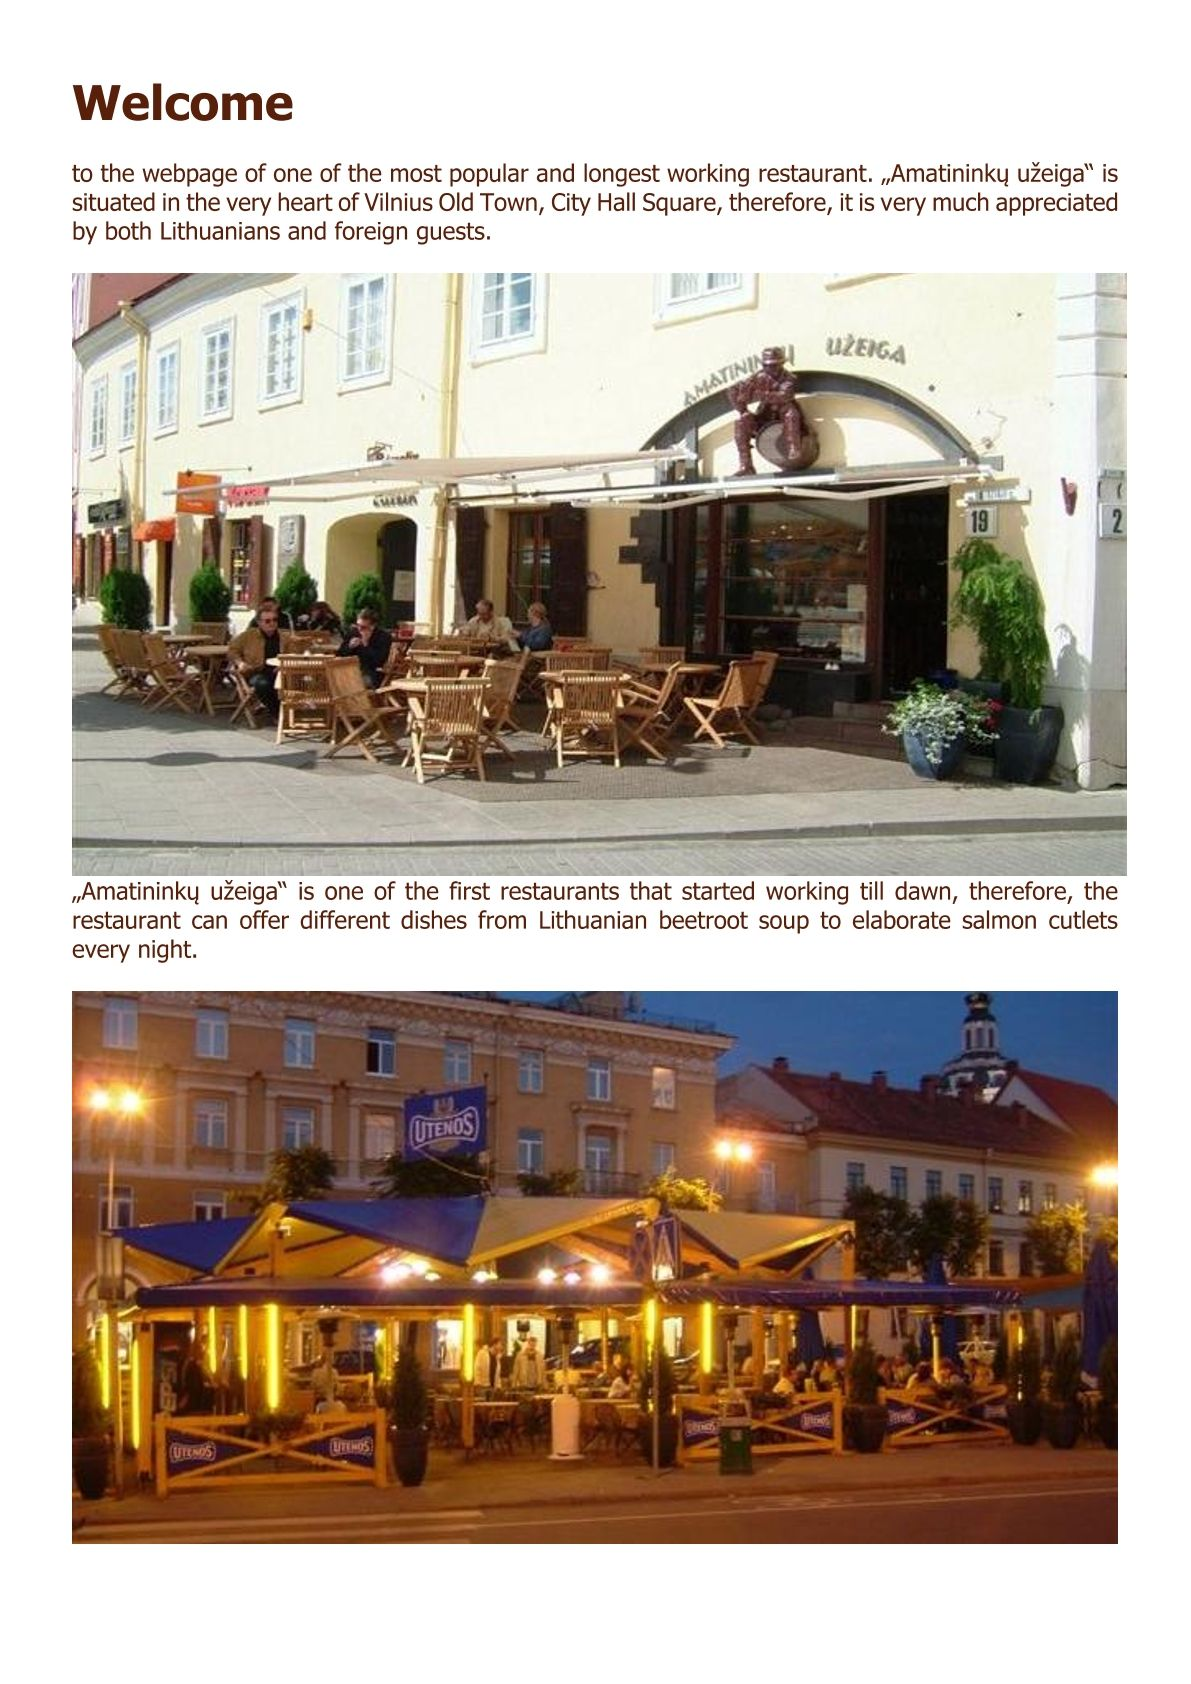 About us Amatininkai www.amatininkai.lt/welcome/ #about us #restaurants #info